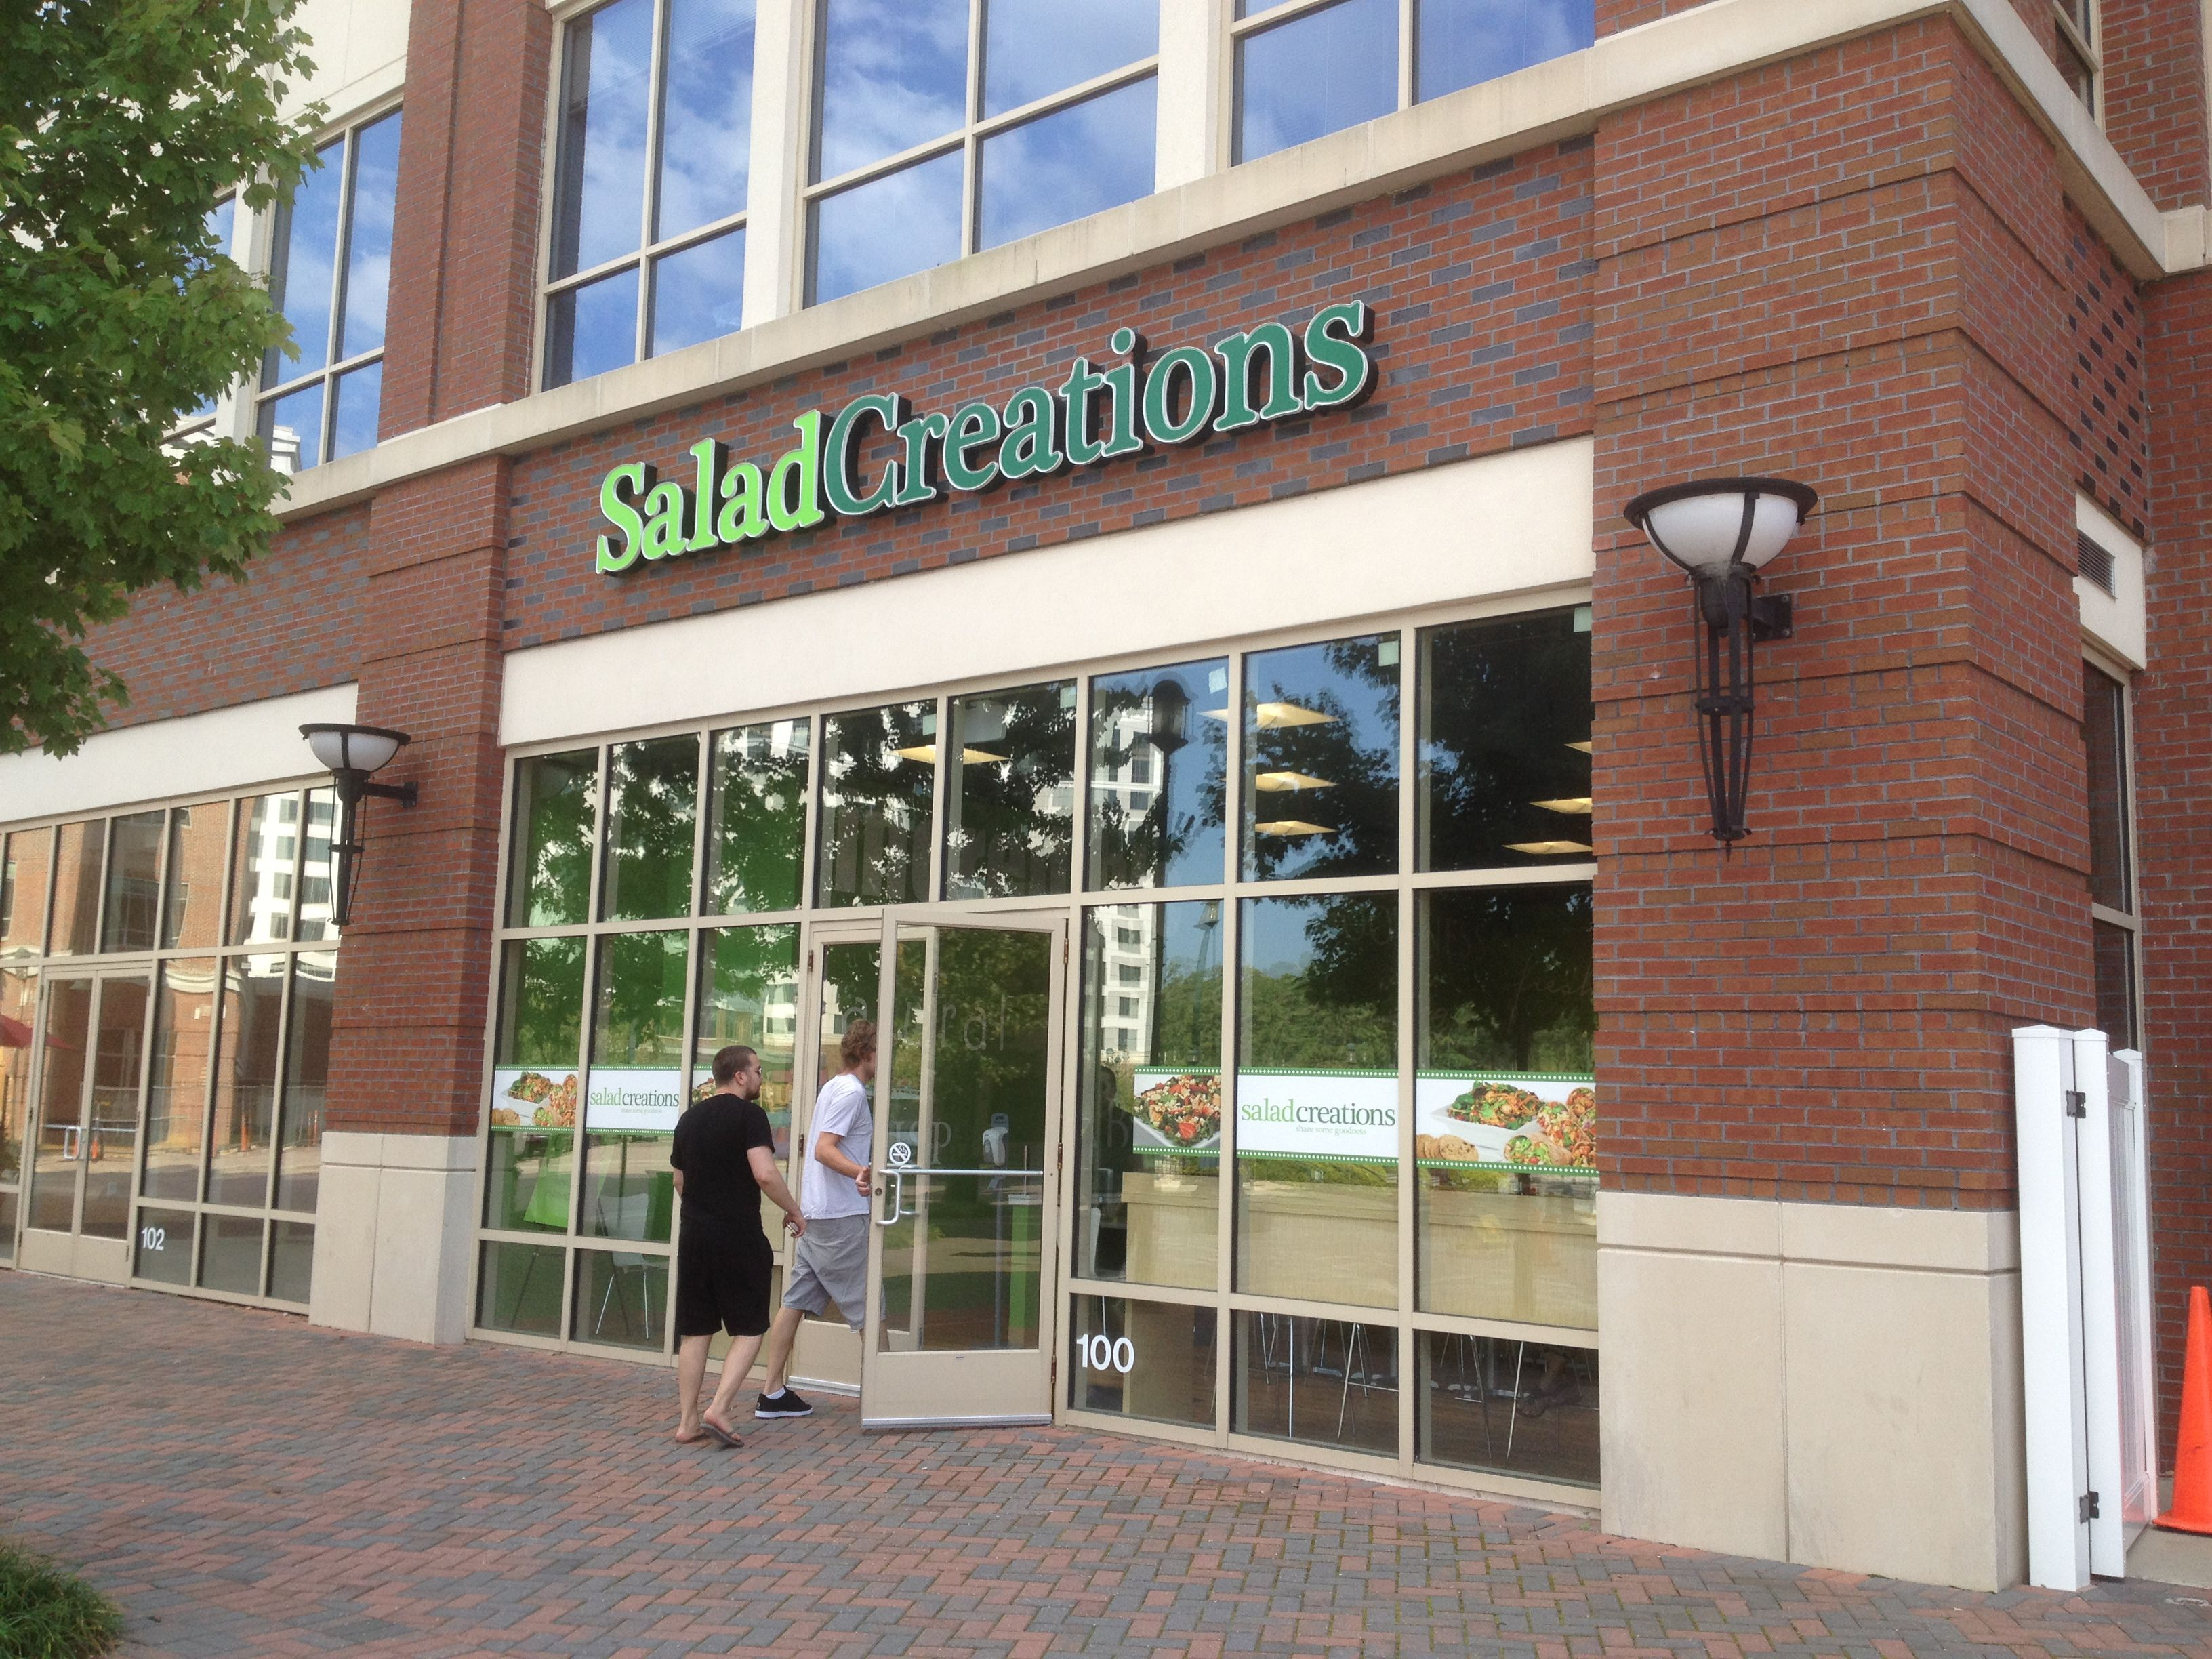 Salad Creations In City Center At Oyster Point Tourism Development Newport News Newport News Virginia